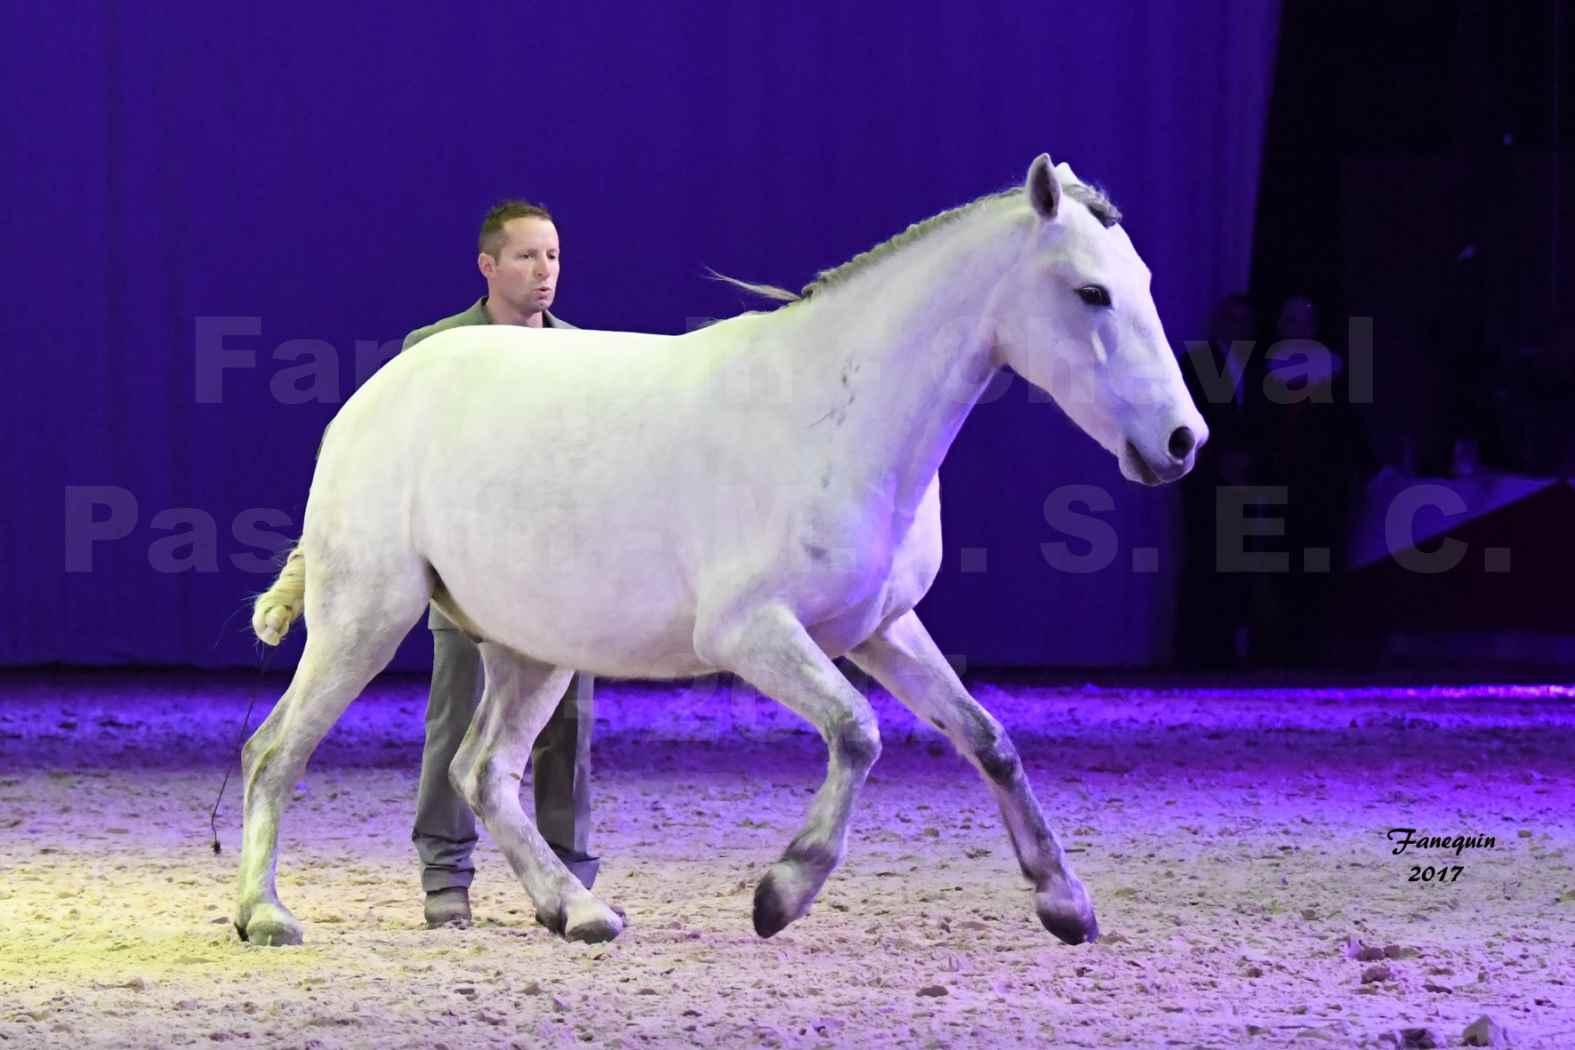 Cheval Passion 2017 - M. I. S. E. C. - Ludovic LONGO & 1 cheval en liberté - 03